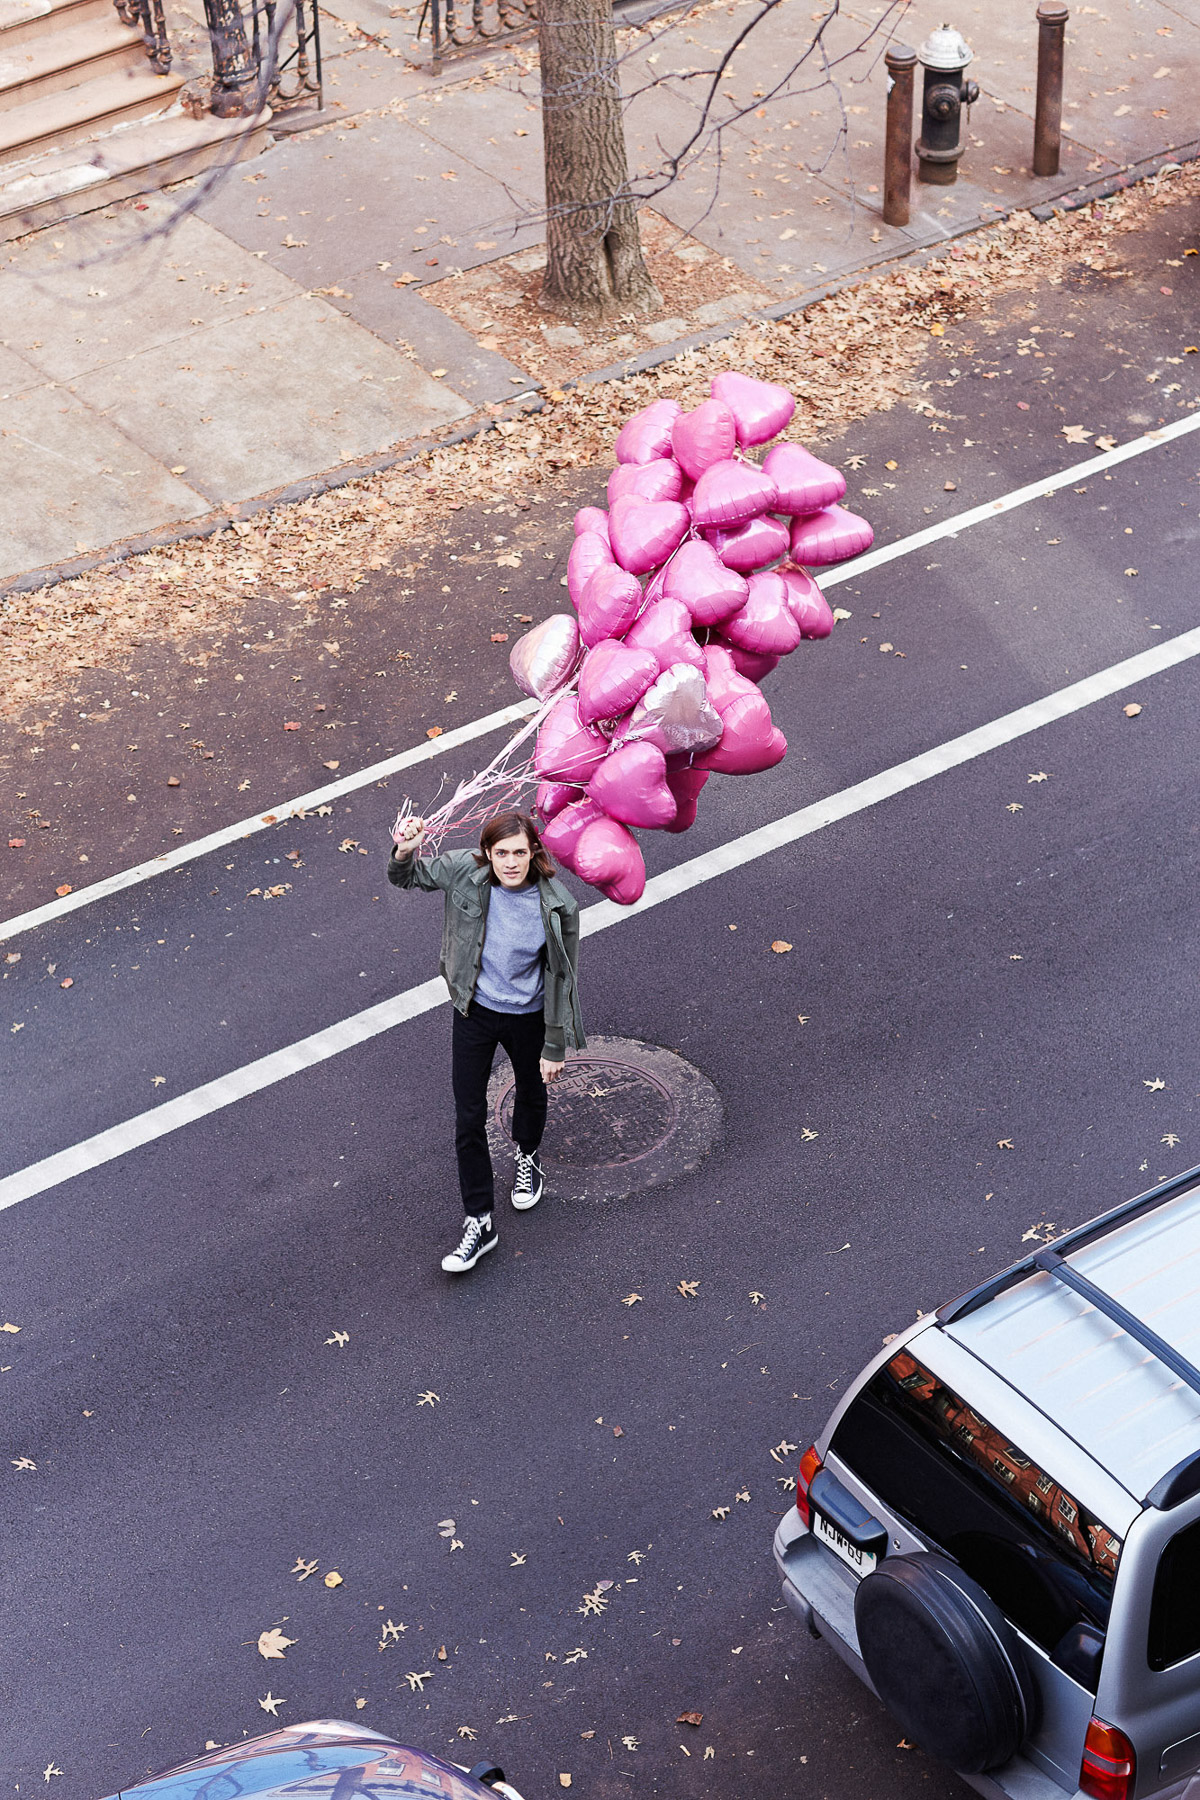 galindo-urban-outfitters-31.jpg